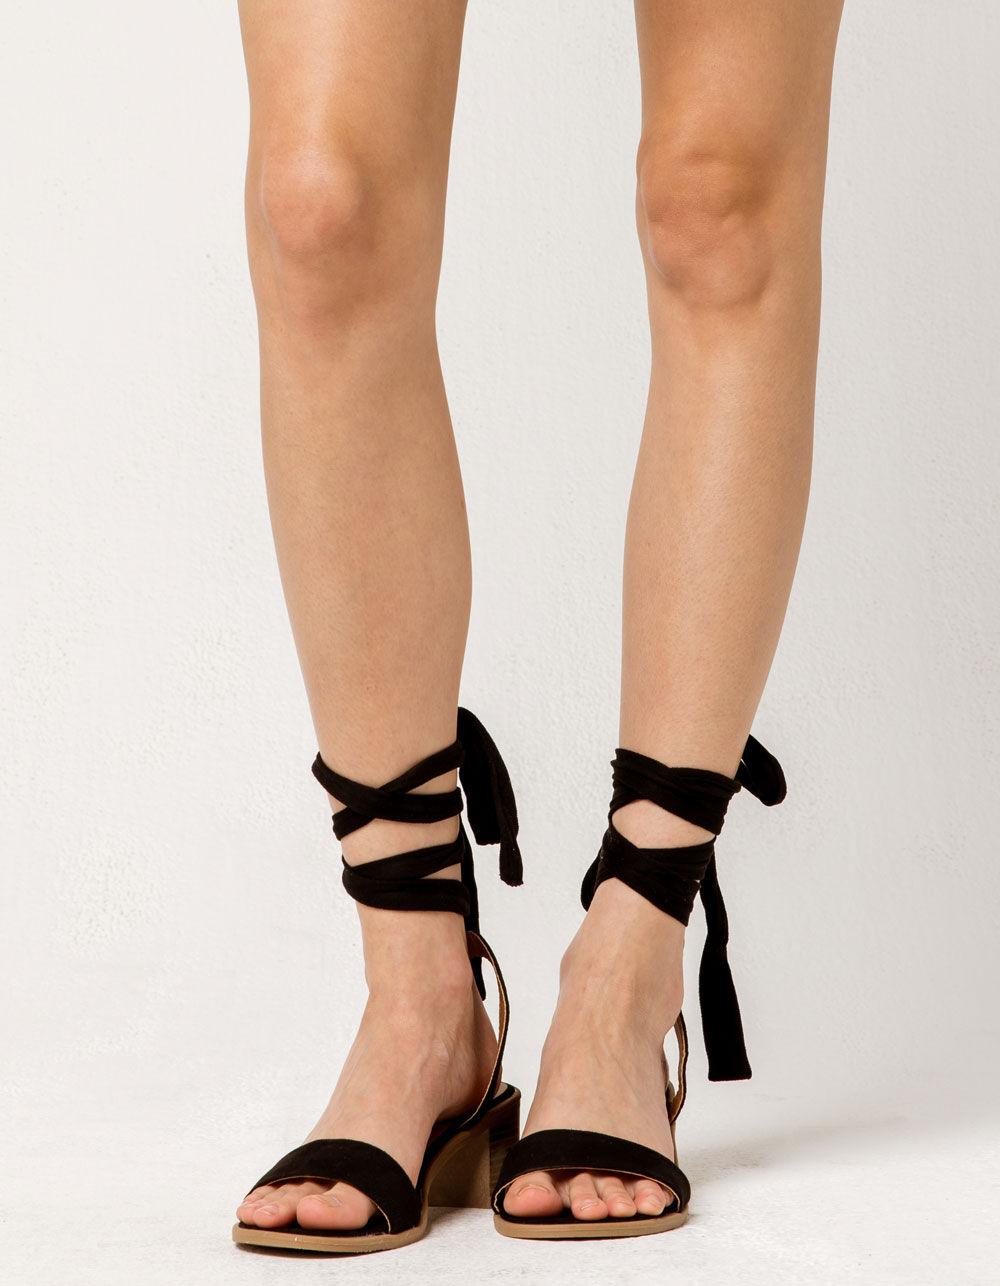 WILD DIVA Lace Up Black Block Heels